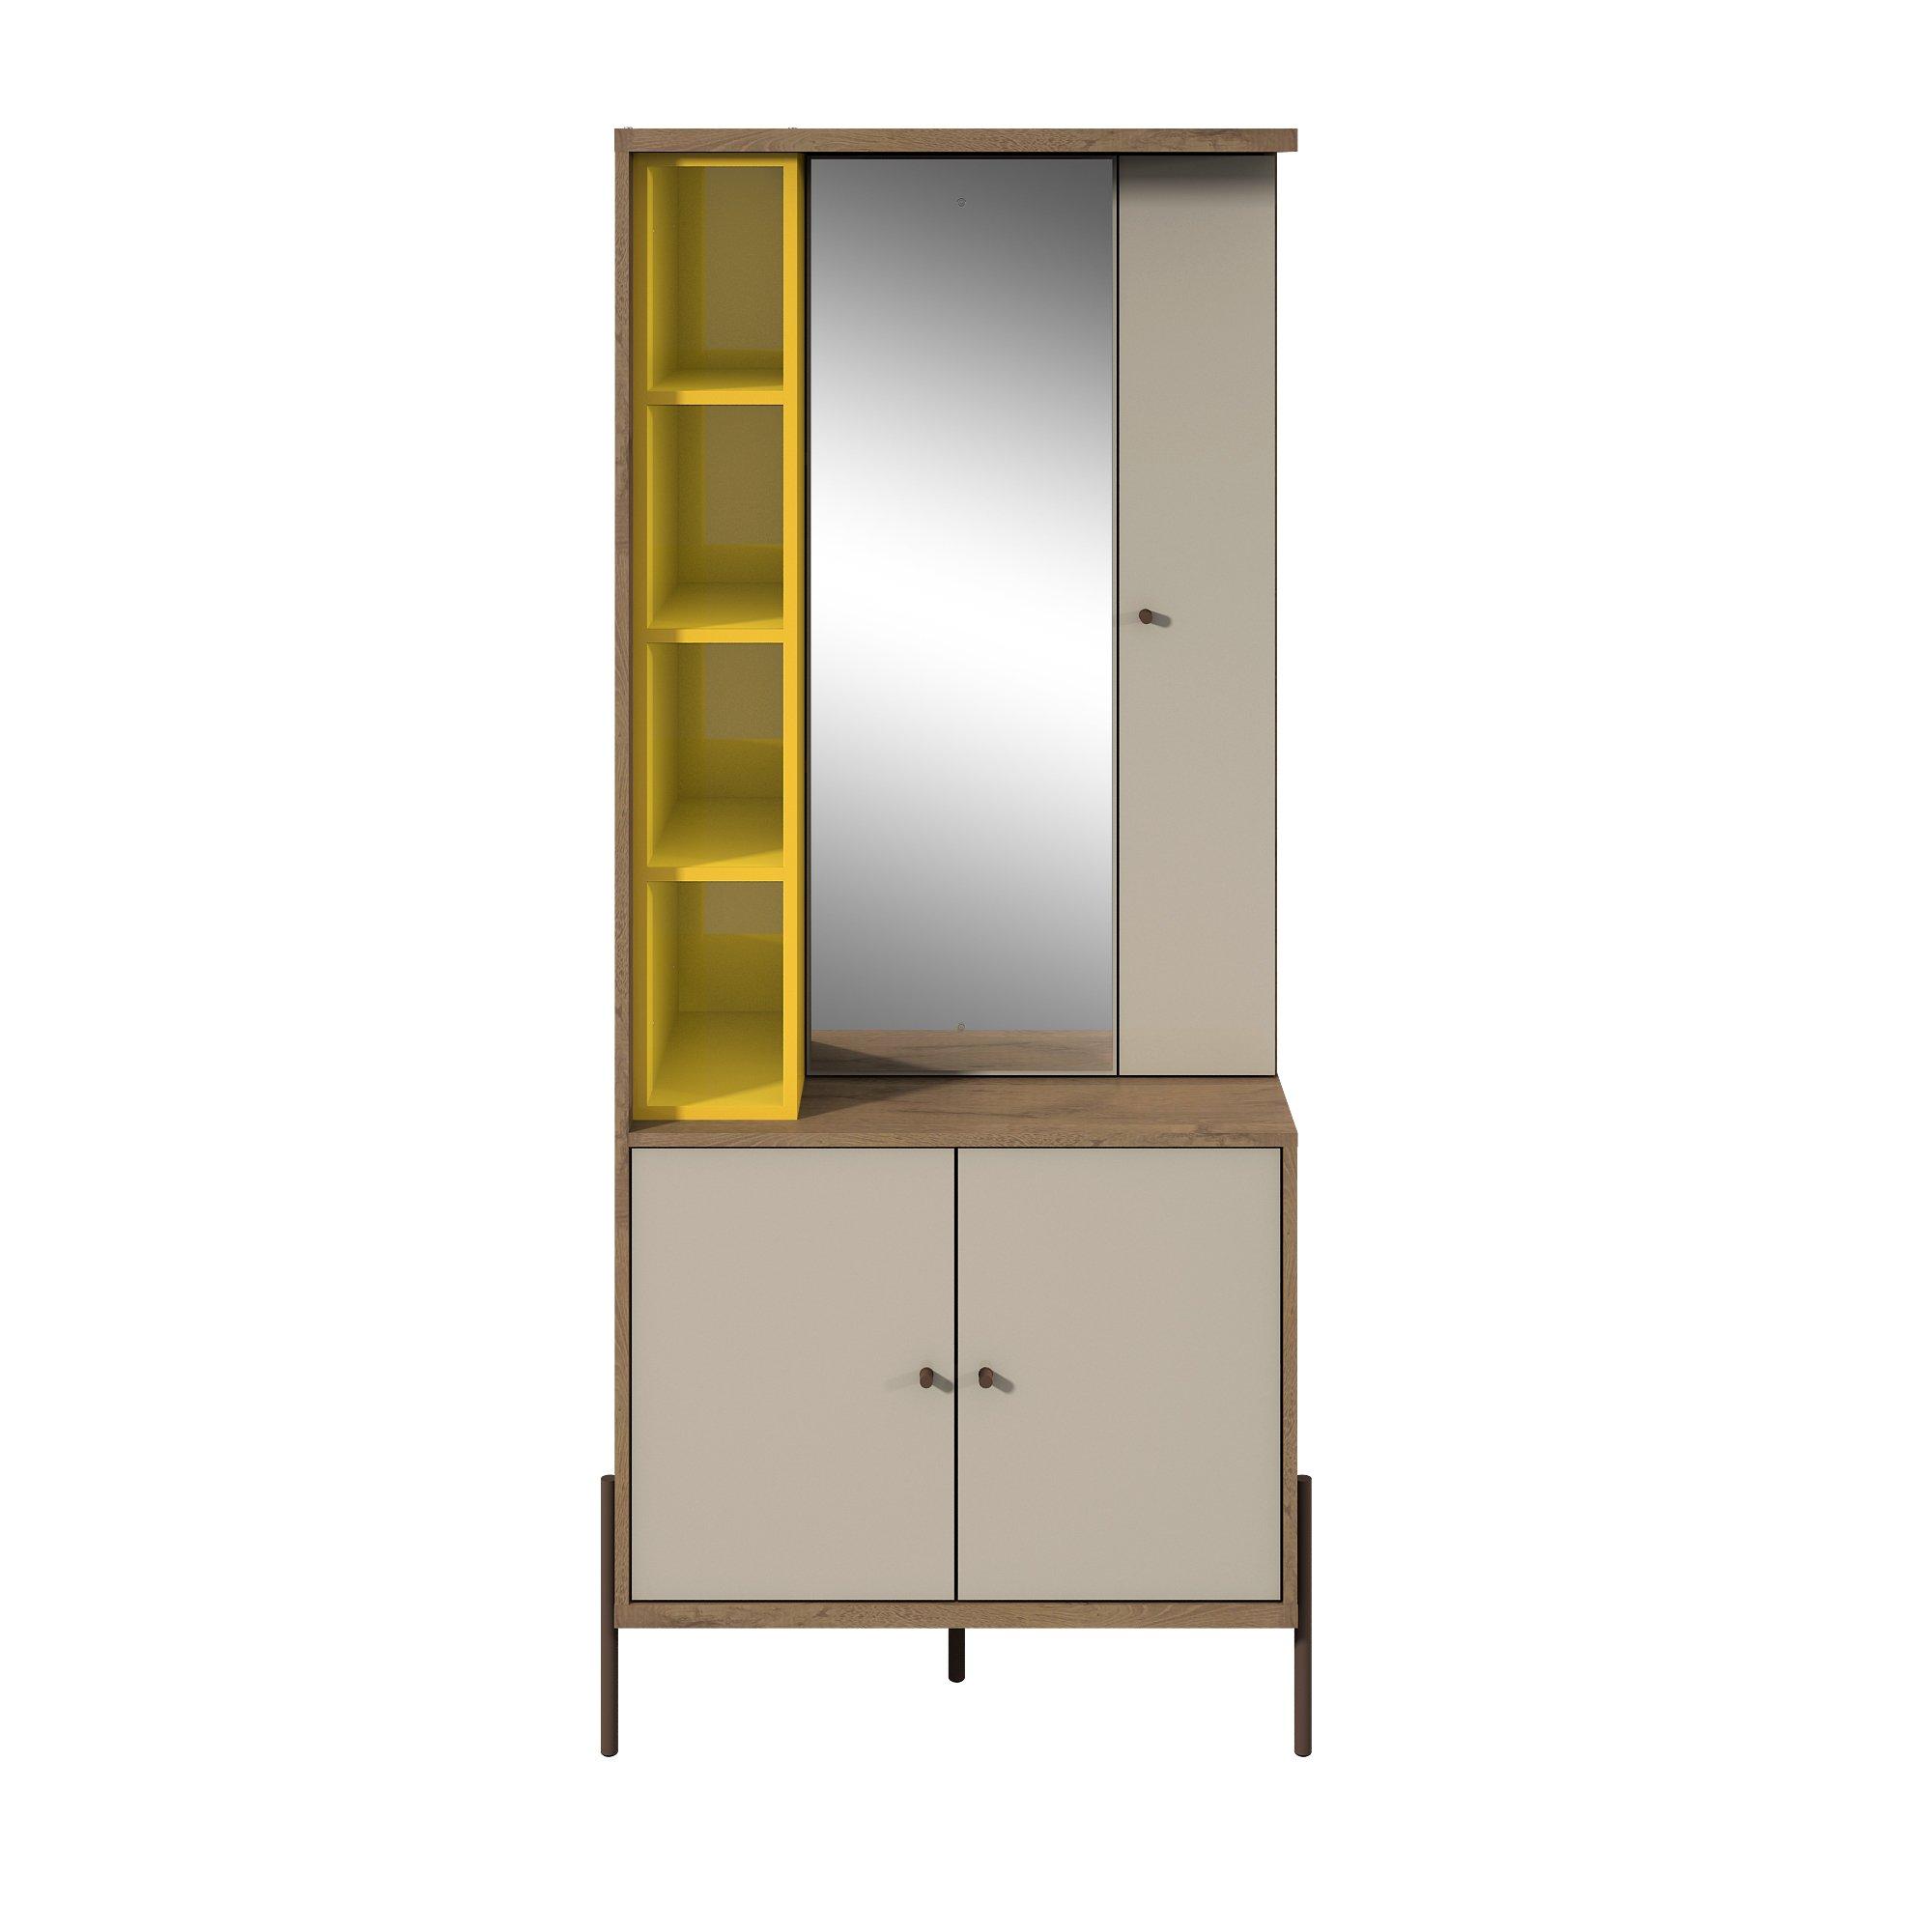 Manhattan Comfort Joy Series Bedroom Storage, Yellow/Off-White by Manhattan Comfort